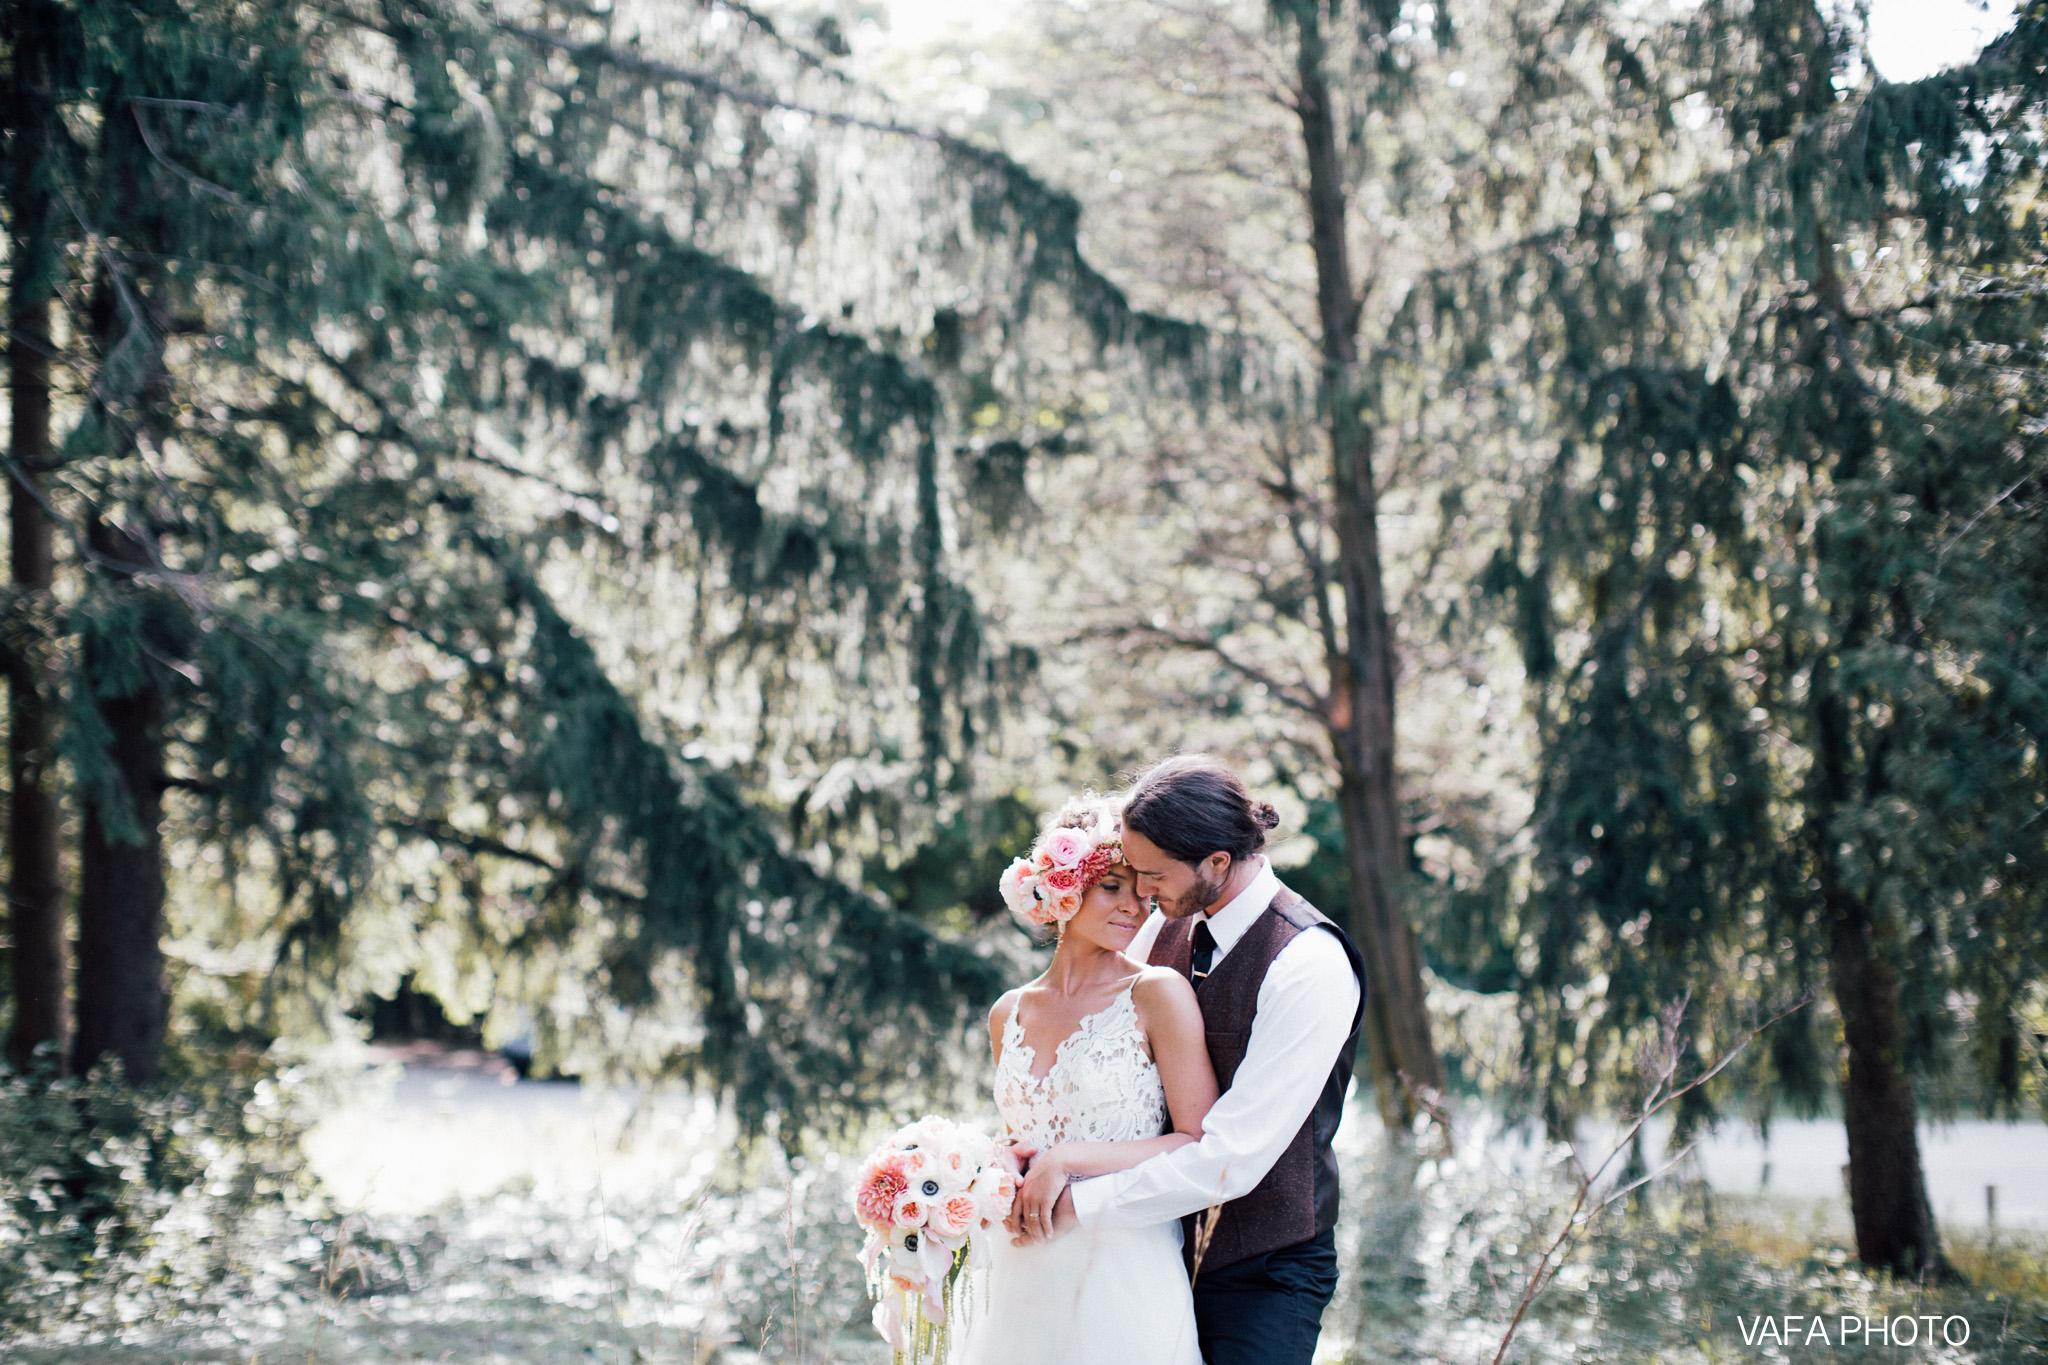 The-Felt-Estate-Wedding-Kailie-David-Vafa-Photo-747.jpg